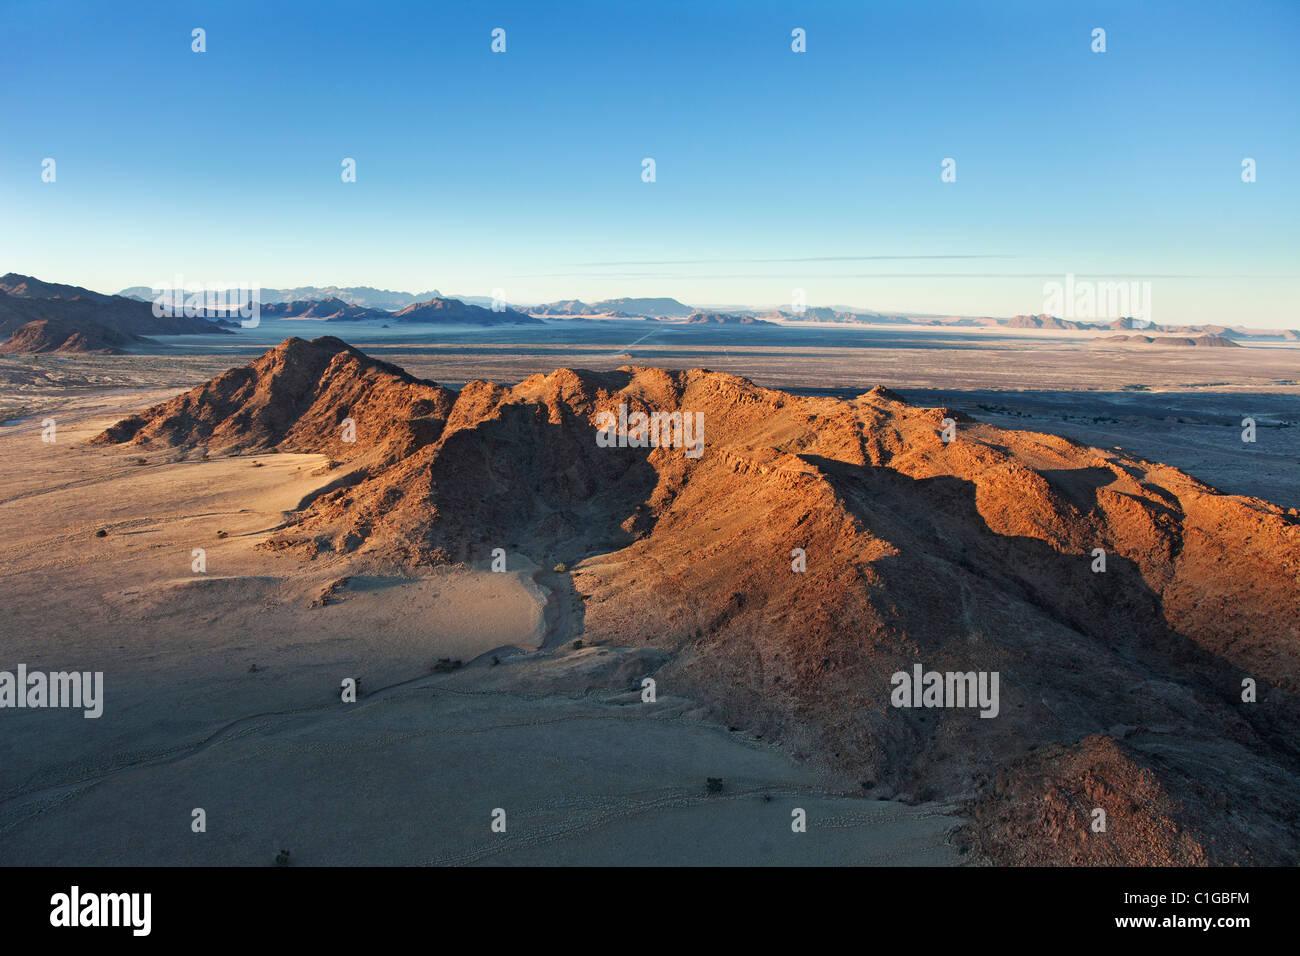 Mountain range. Namib desert, Naukluft National Park, Namibia. - Stock Image